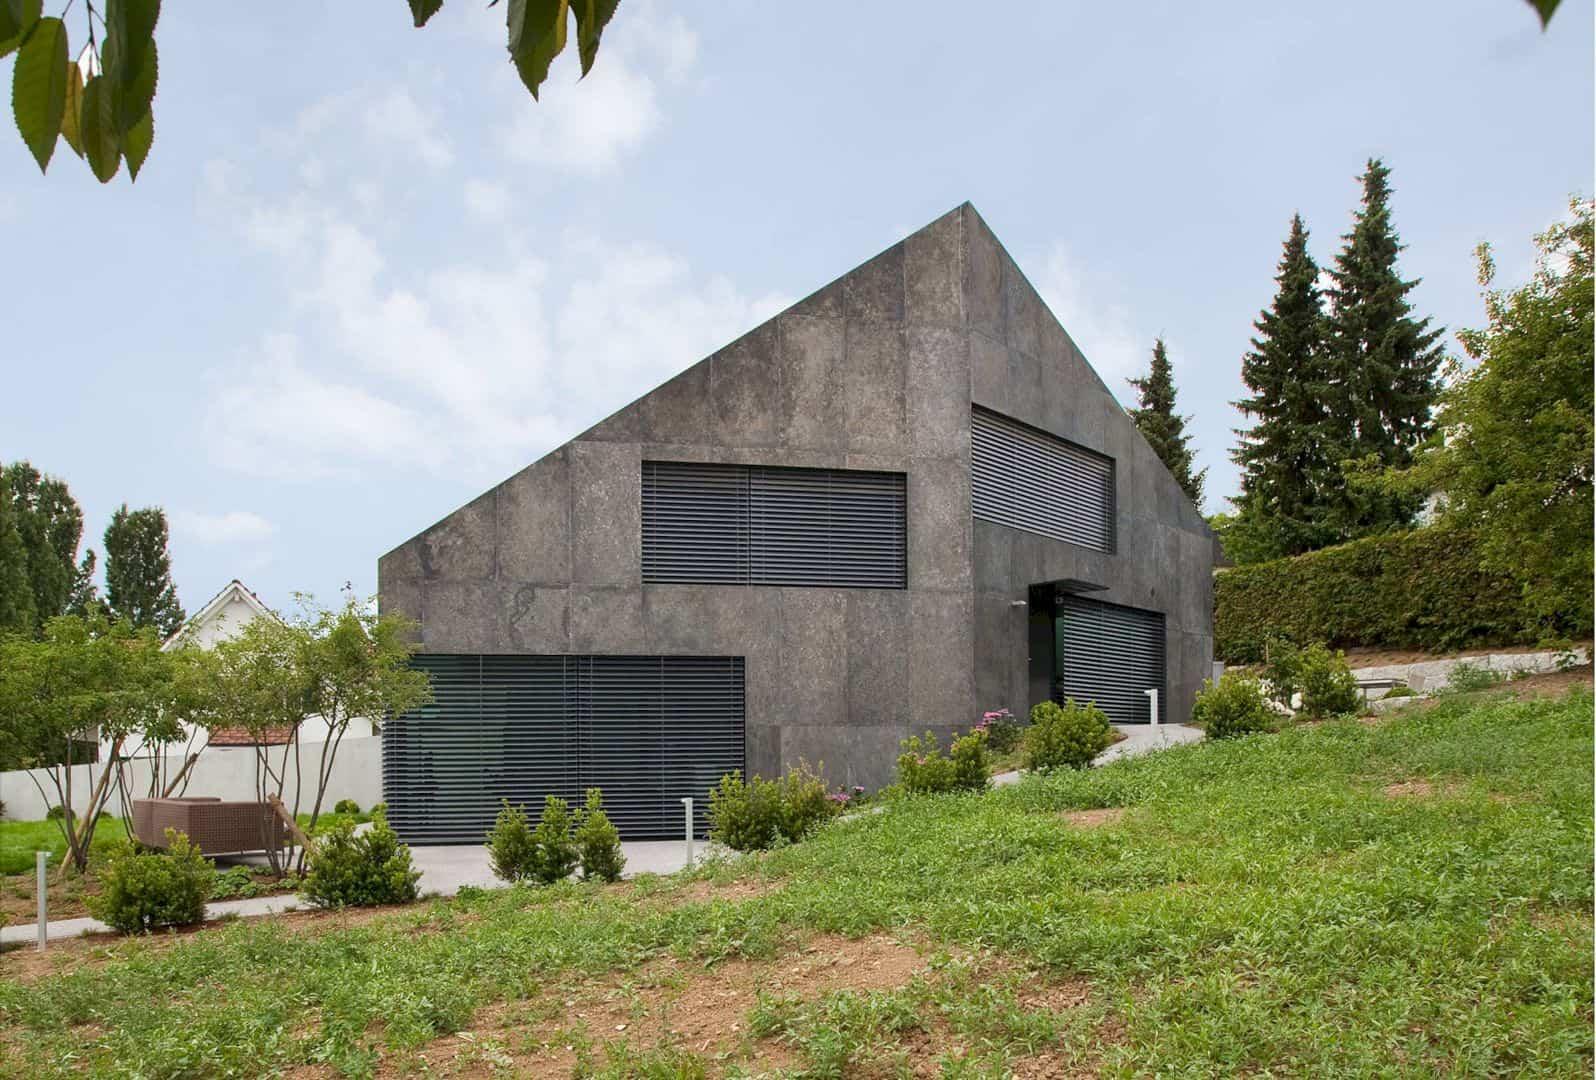 2 EFH Wingert Oberweningen By L3P Architekten 12